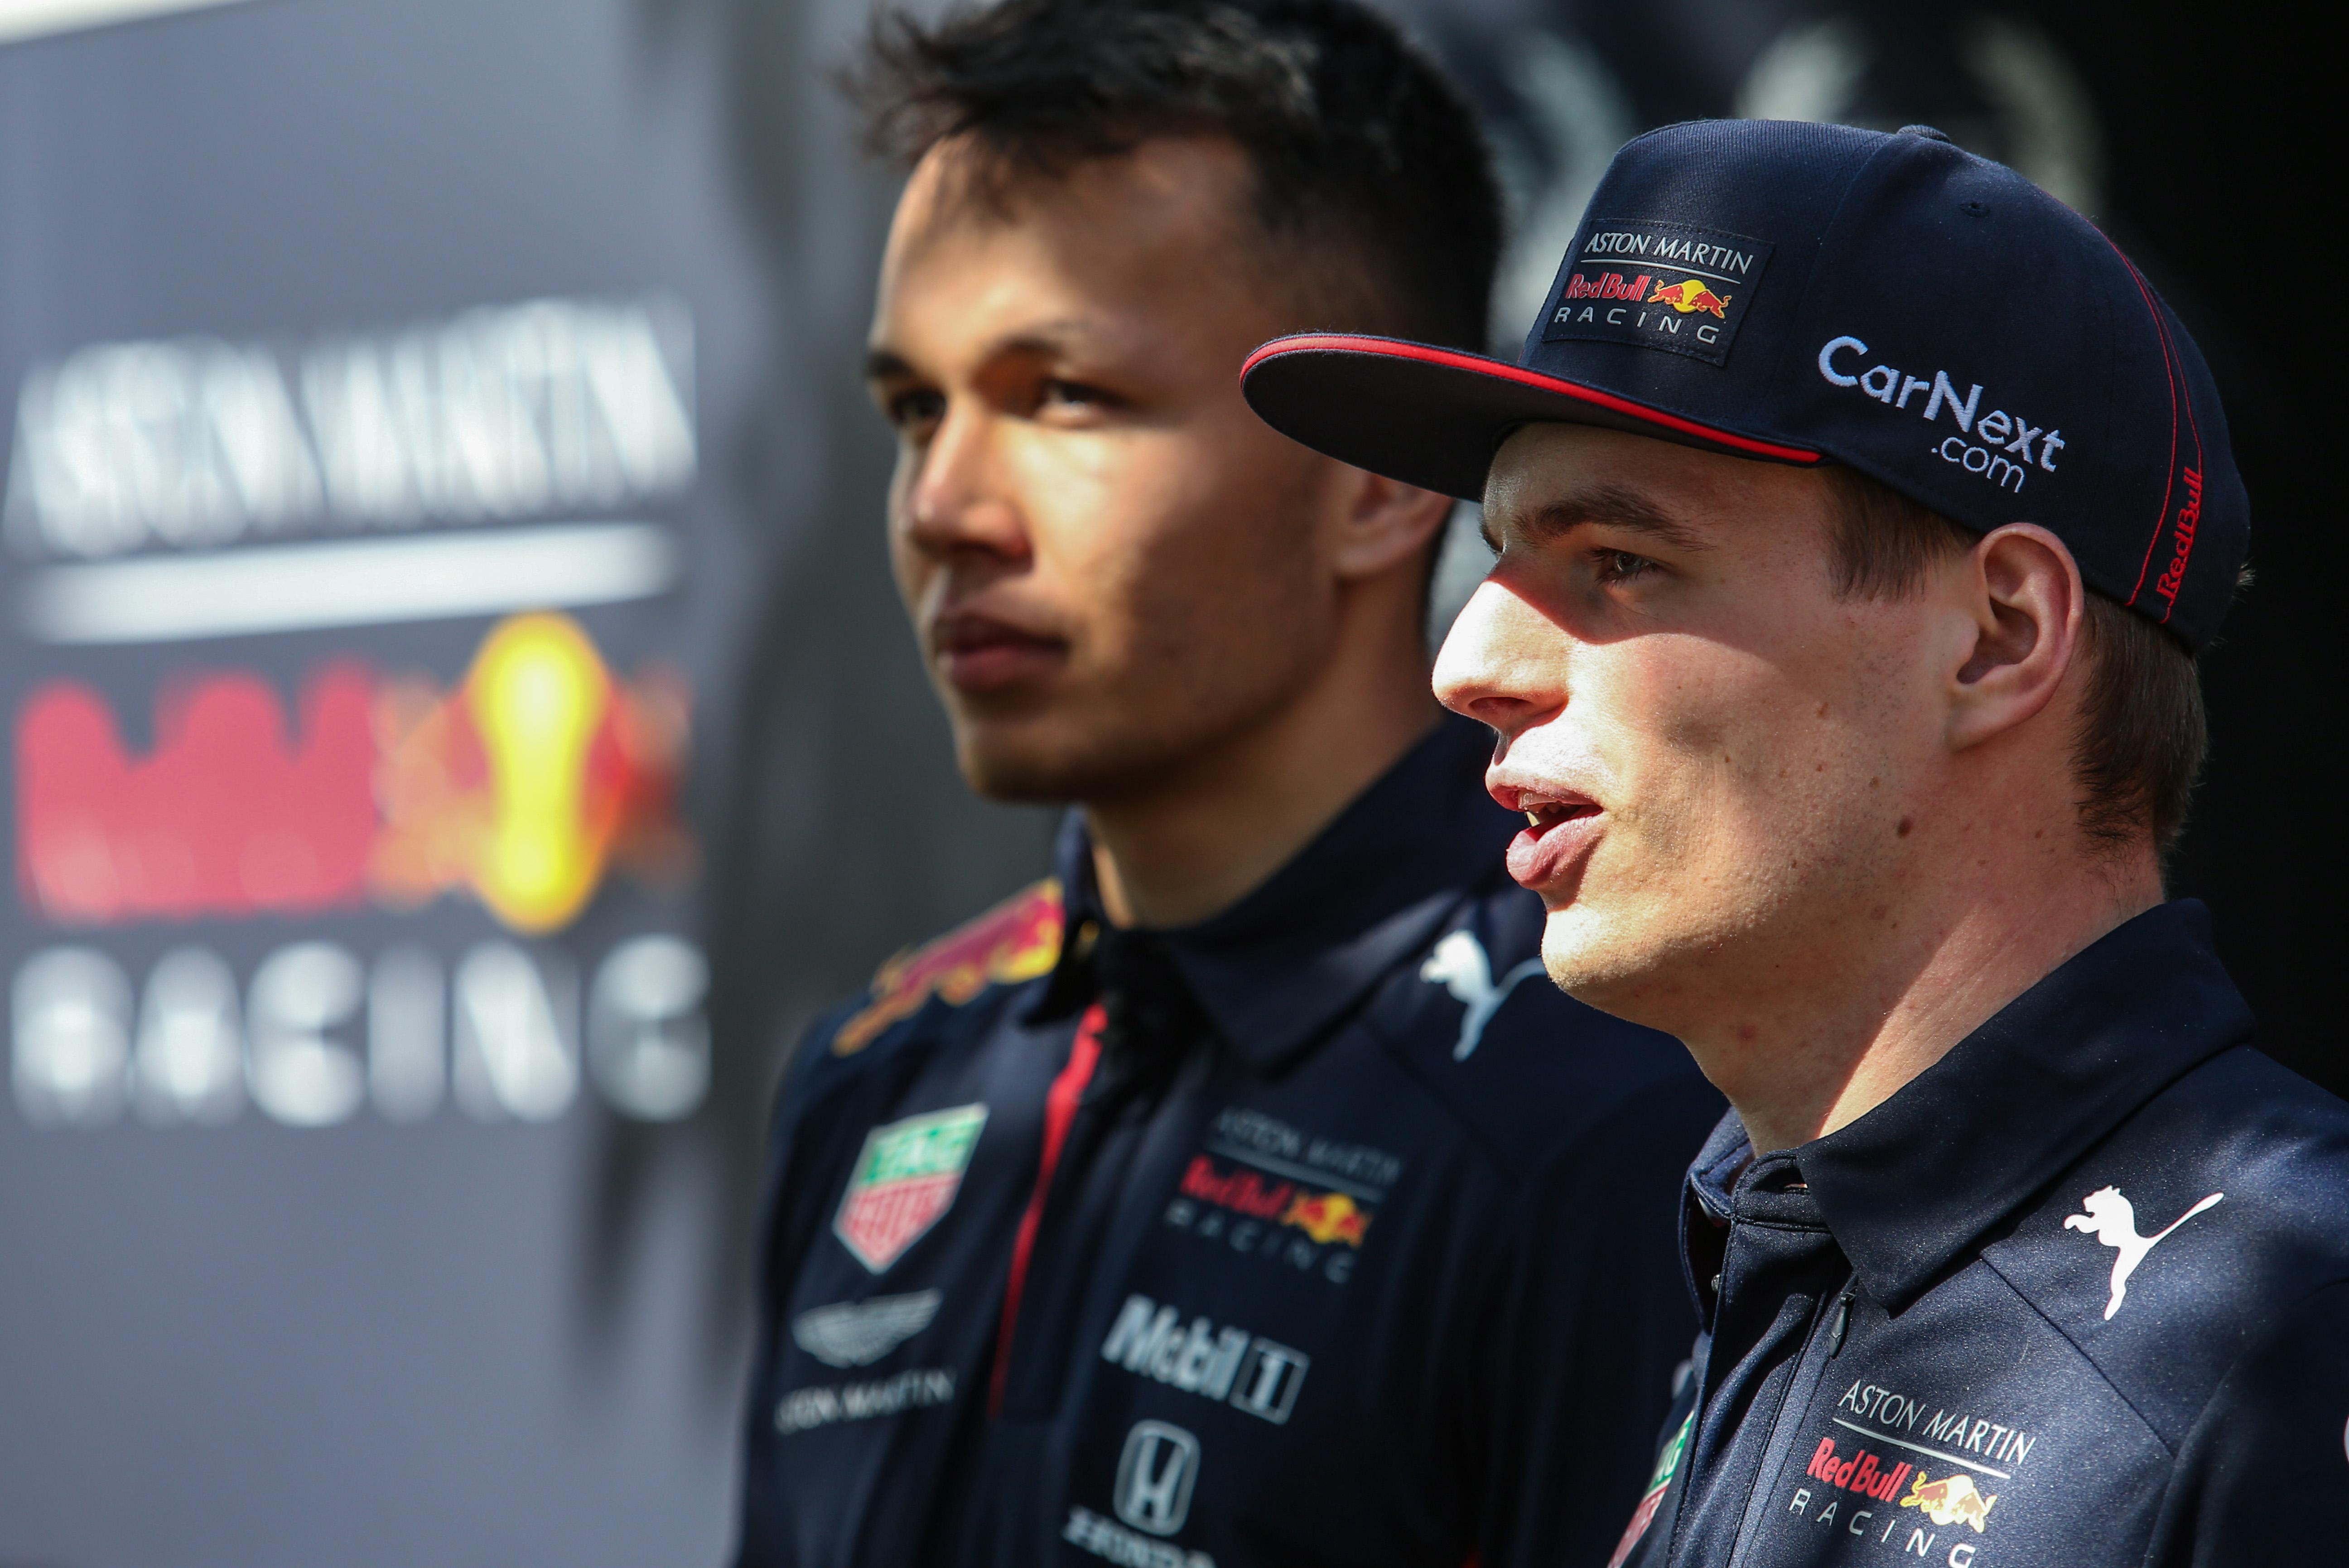 Motor Racing Formula One World Championship Australian Grand Prix Preparation Day Thursday Melbourne, Australia